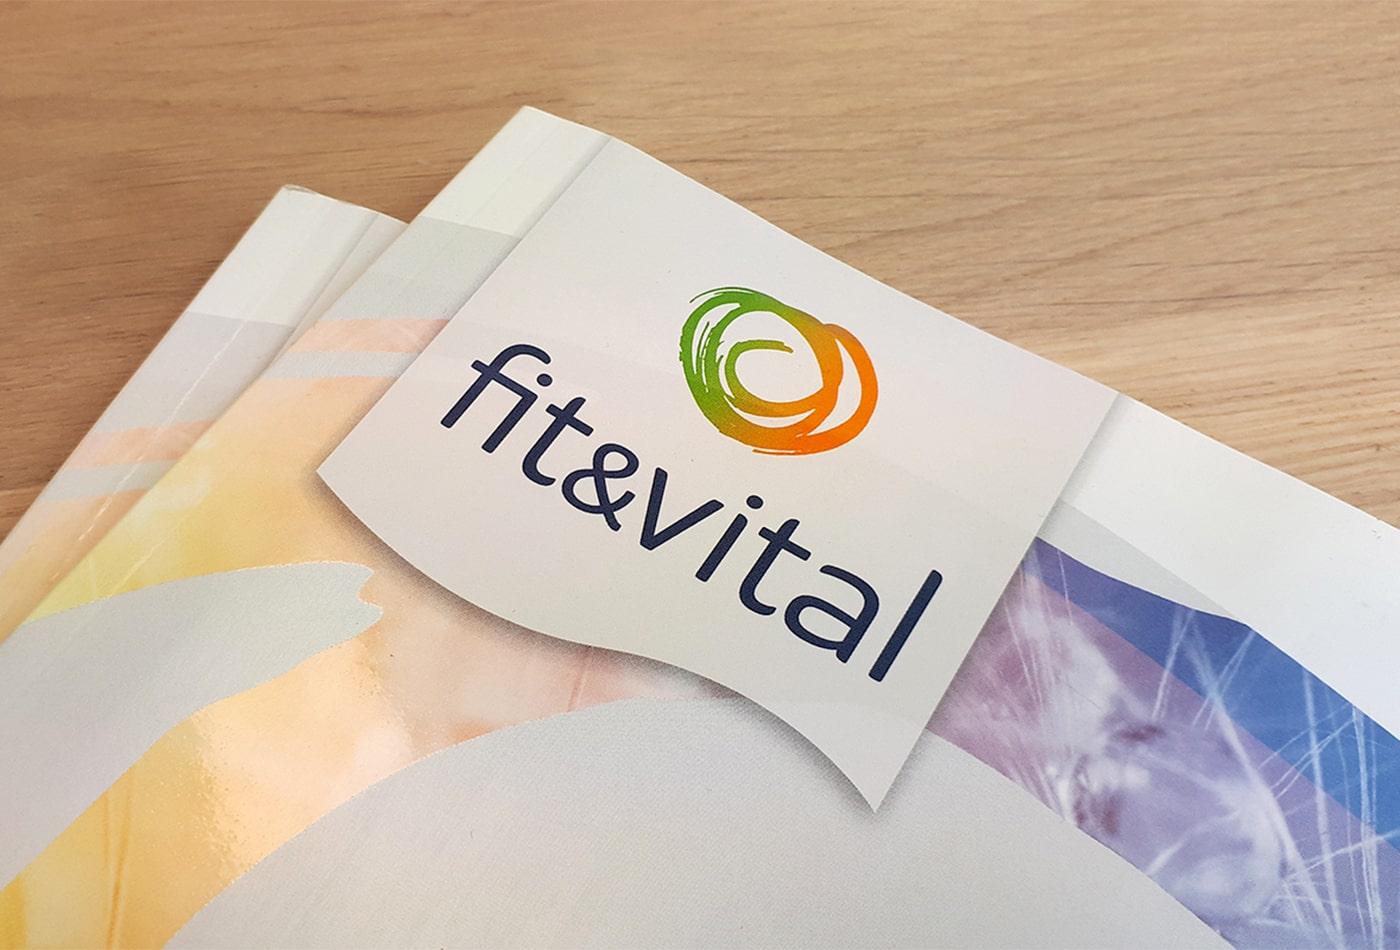 wildefreunde-kunde-fit&vital-logo-1400x950-min